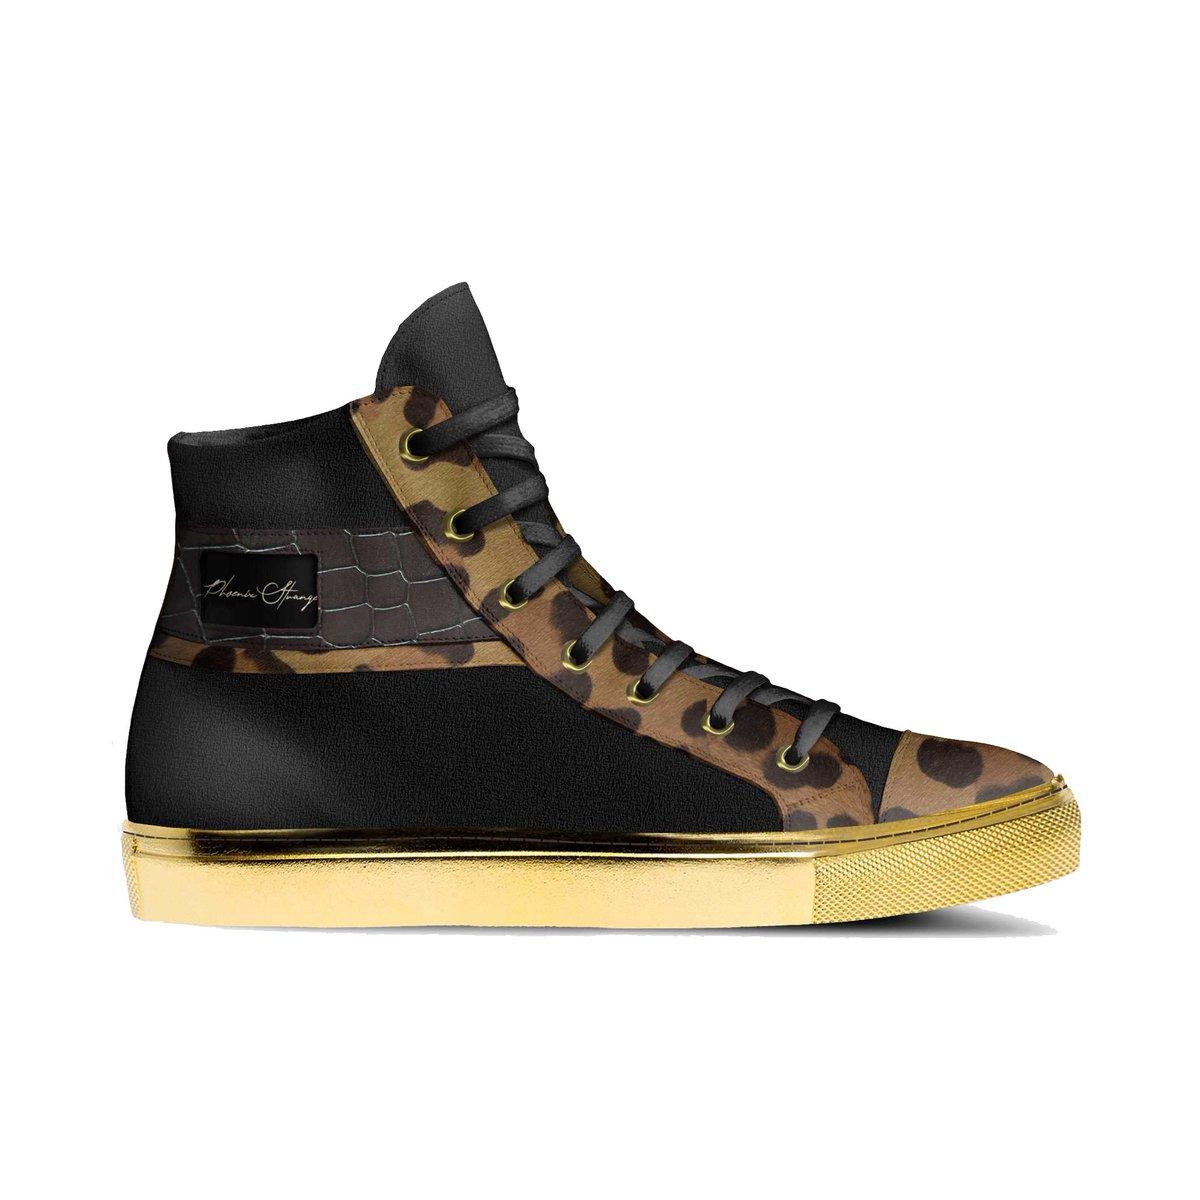 Women's Adonia Classic High Top  ➤ $ 214.  ➤ https://t.co/EGr020LDll    #apparel #clothes #footwear #shoes #womenswear #menswear https://t.co/WyXRpQeMDC